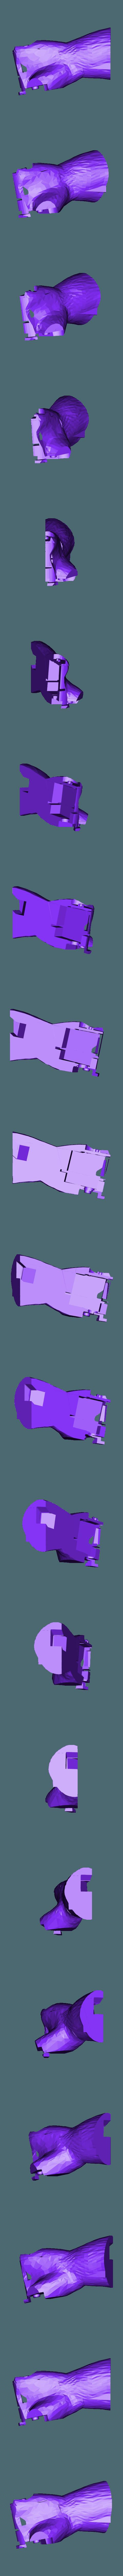 GADGETS (left) FOREARM pt2 4 PRINT .stl Download free STL file GADGET the robotic Gremlin • 3D printing object, atarka3